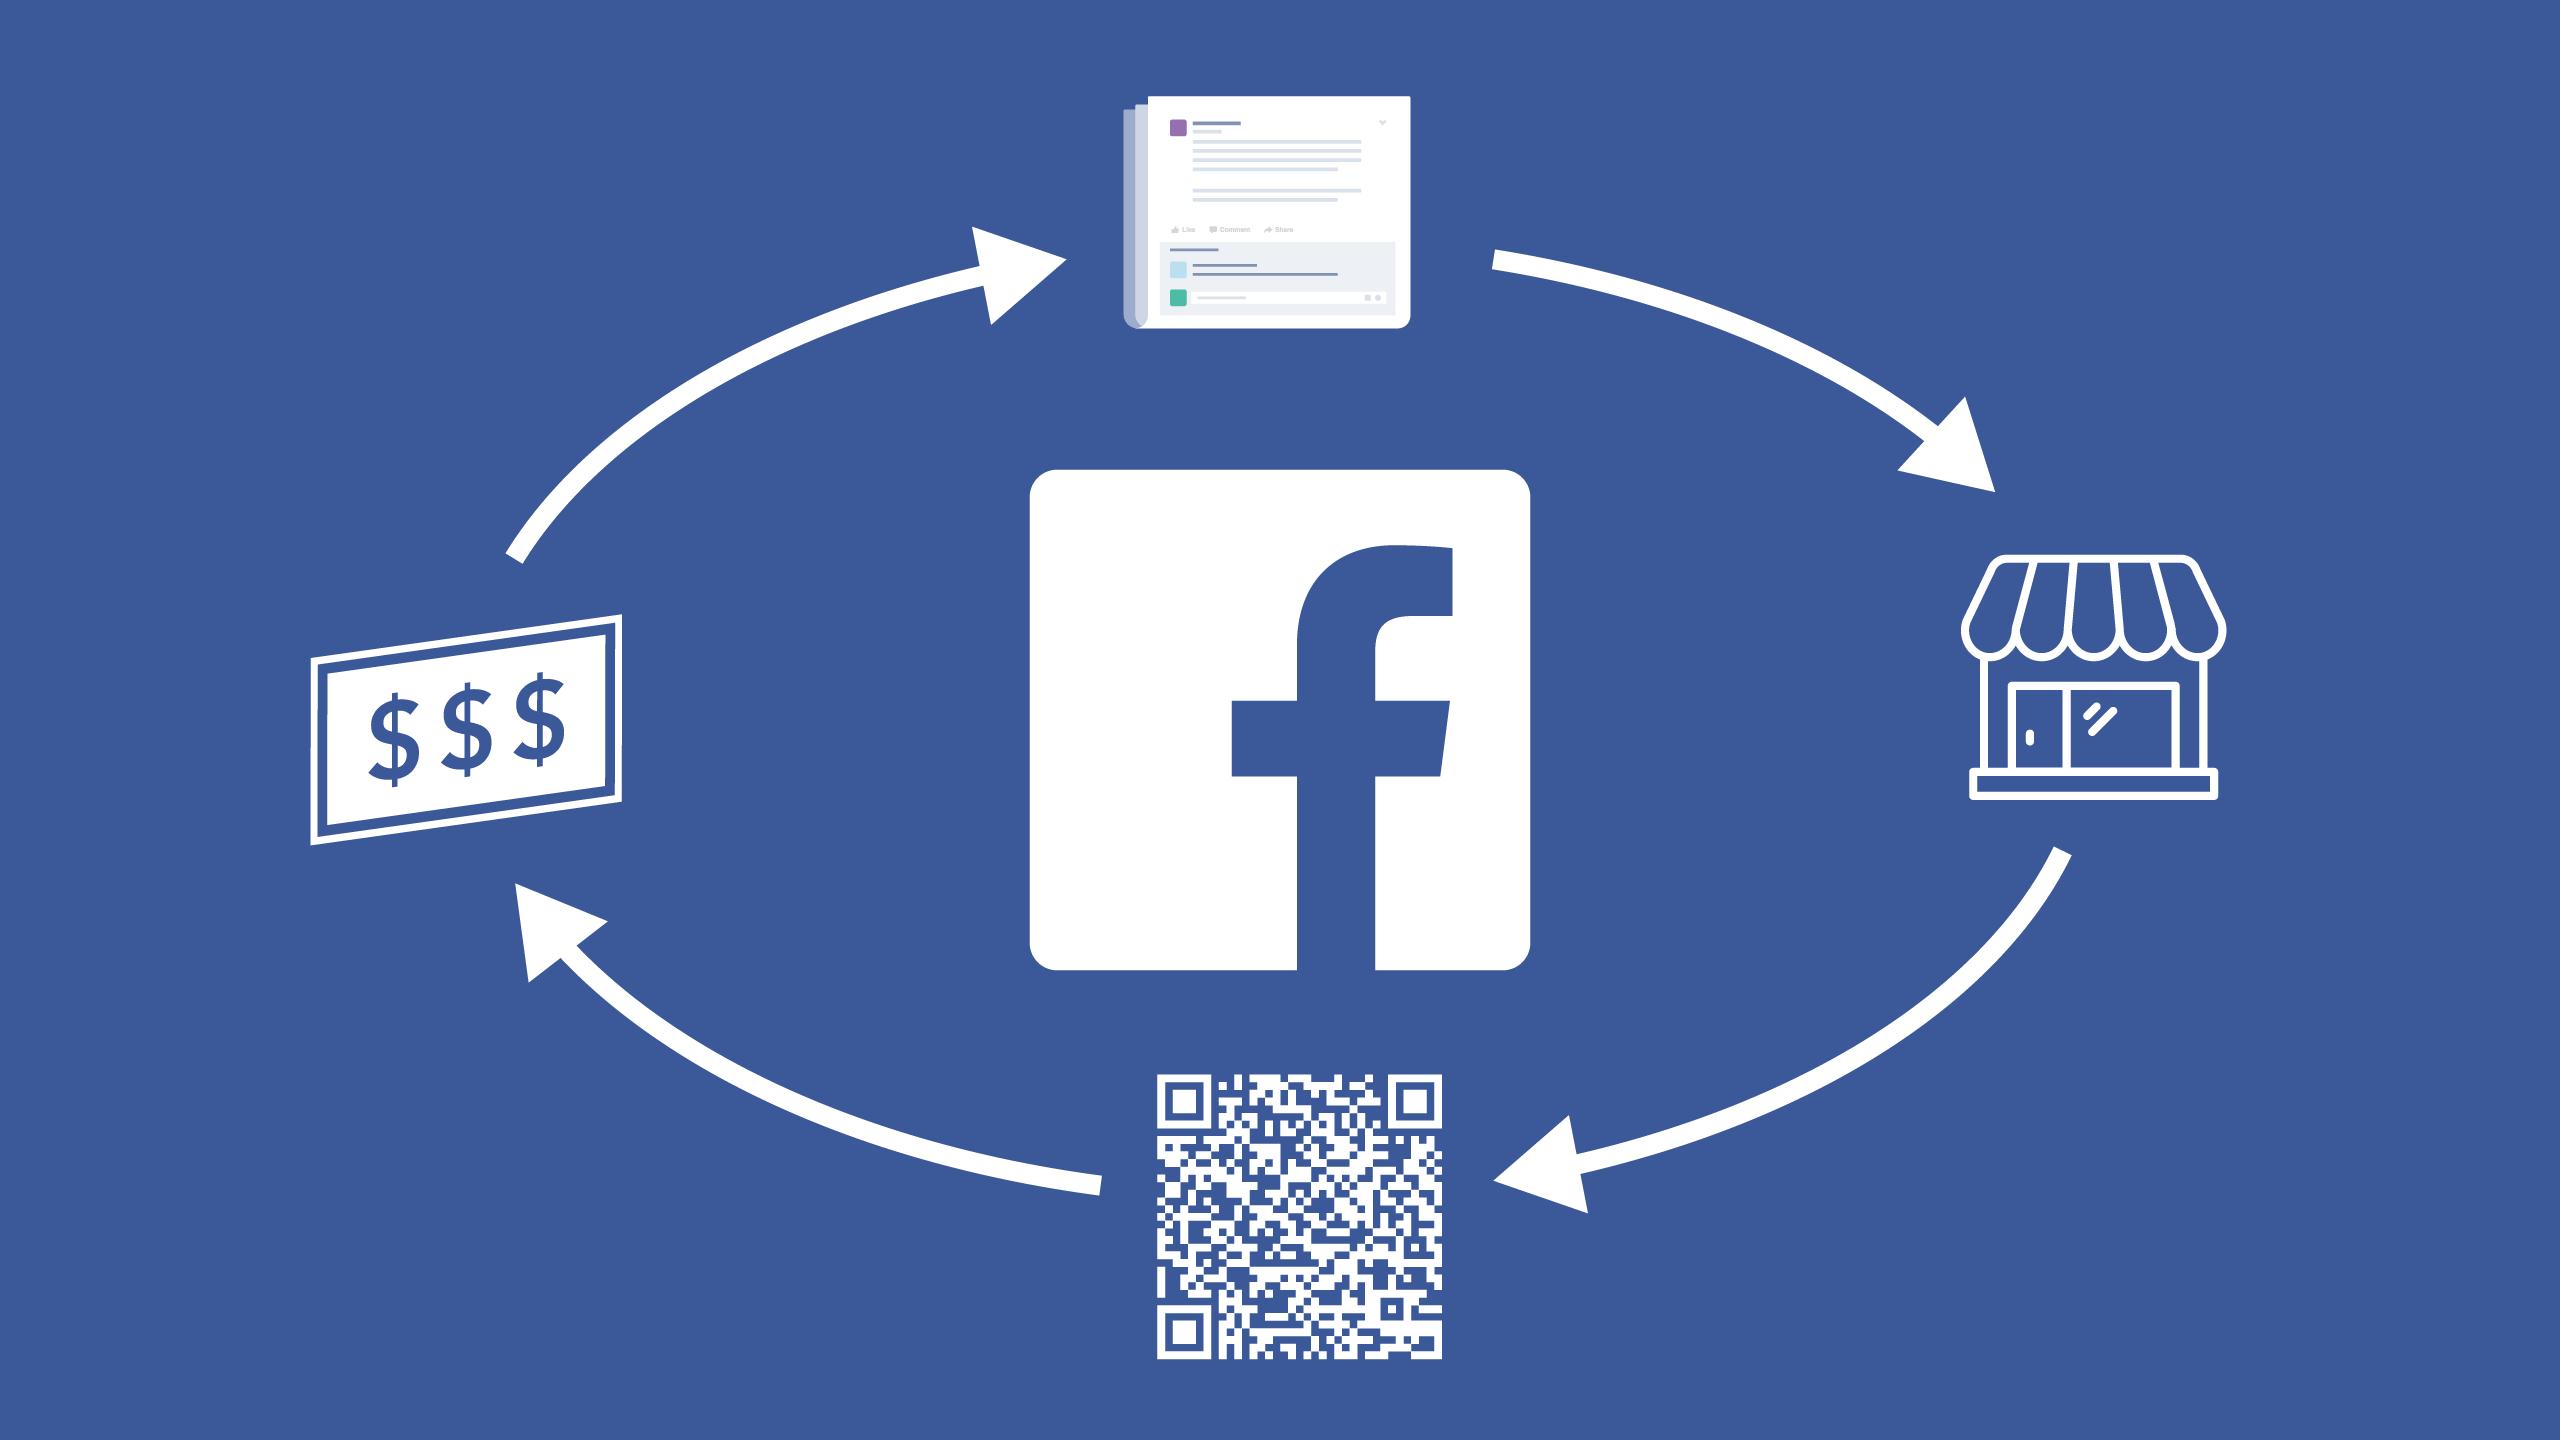 Facebook Seeking To Link Online Efforts To Offline Sales Though QR Code System